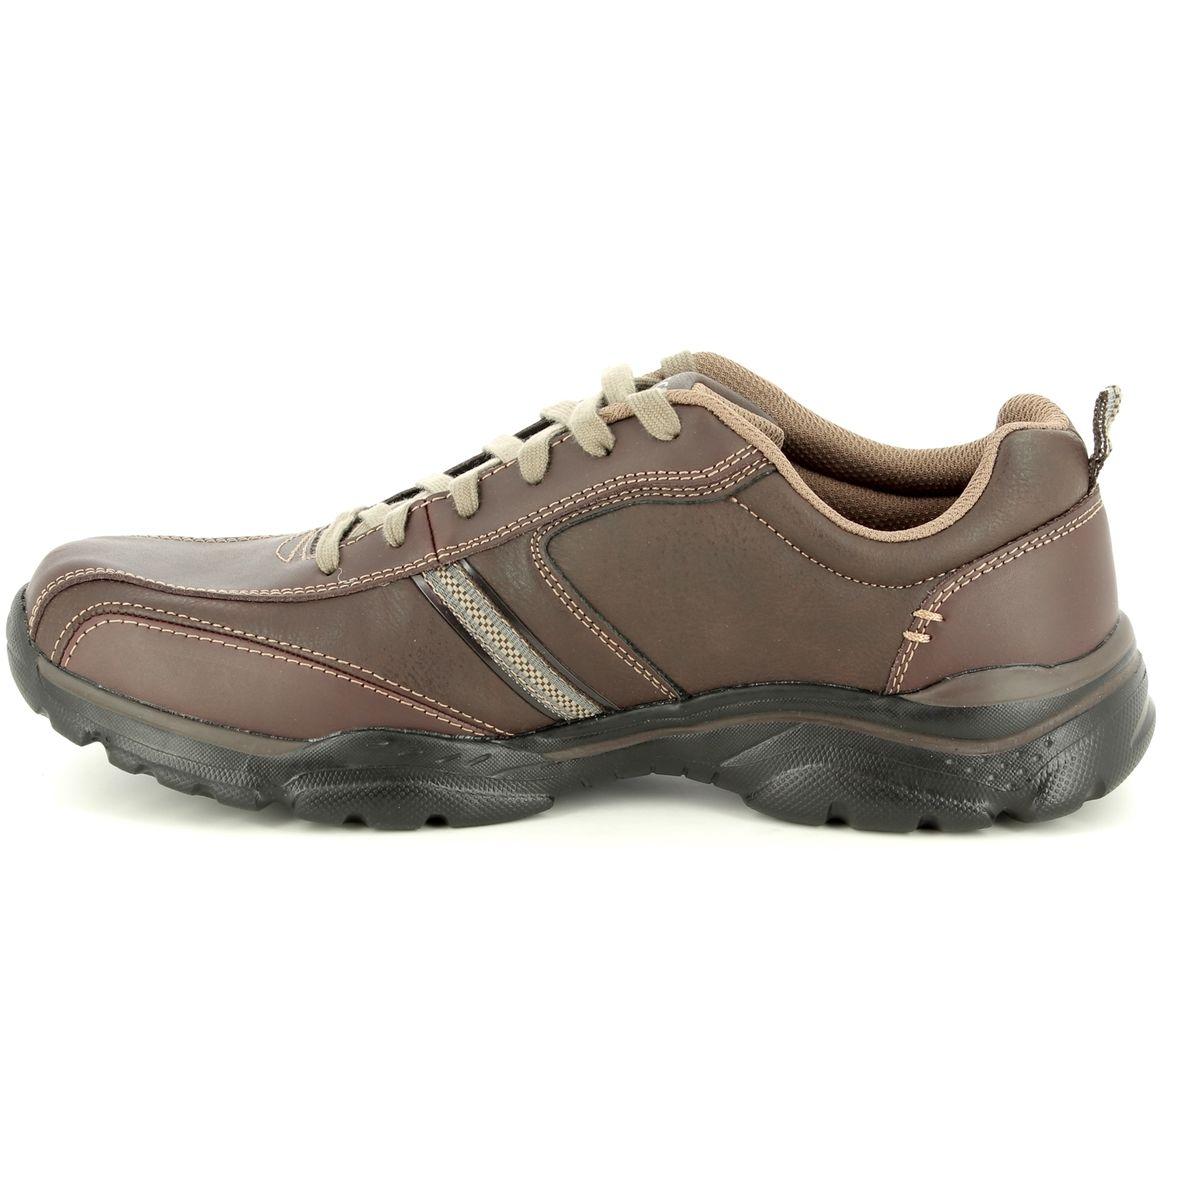 Skechers Rovato Larion 65419 BRN Brown